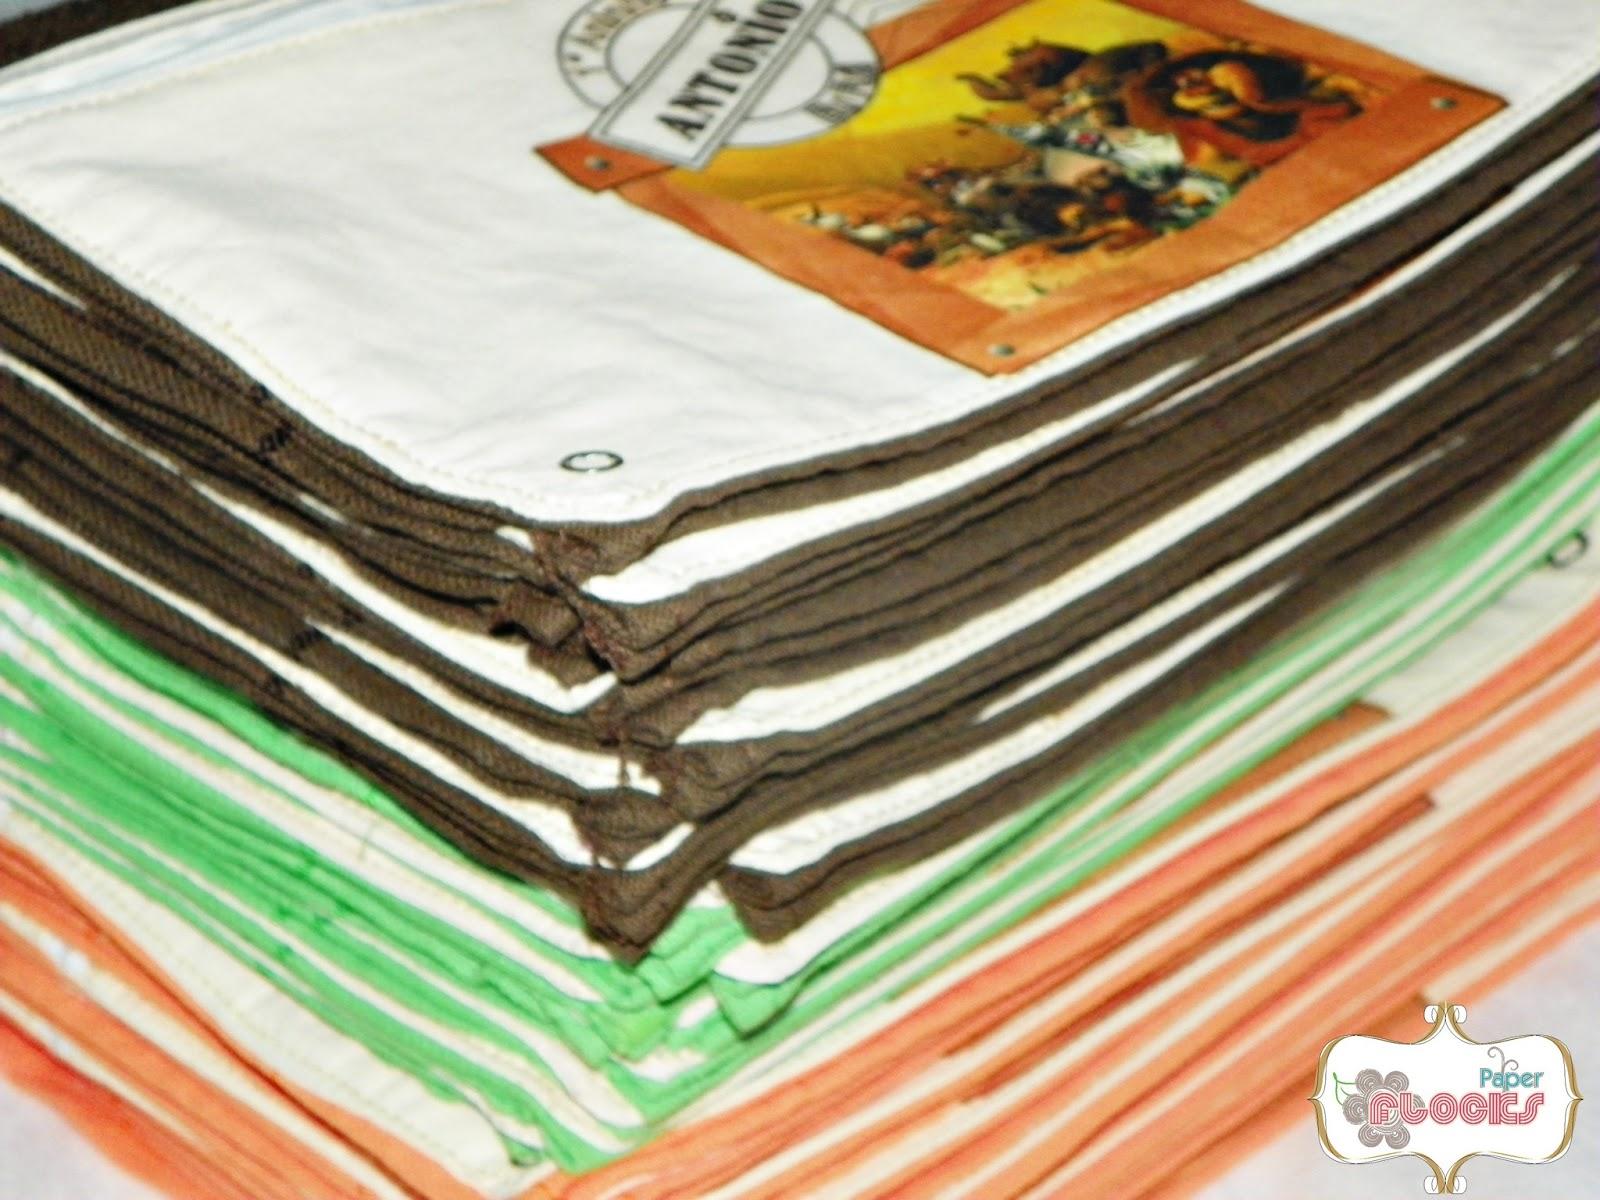 http://4.bp.blogspot.com/-cJpBMRTMXXQ/UKJX8KLqUmI/AAAAAAAABZk/S0rIUuBYs18/s1600/Lembrancinha+madagascar+aniversario+toalhinha+necessaire+08.JPG